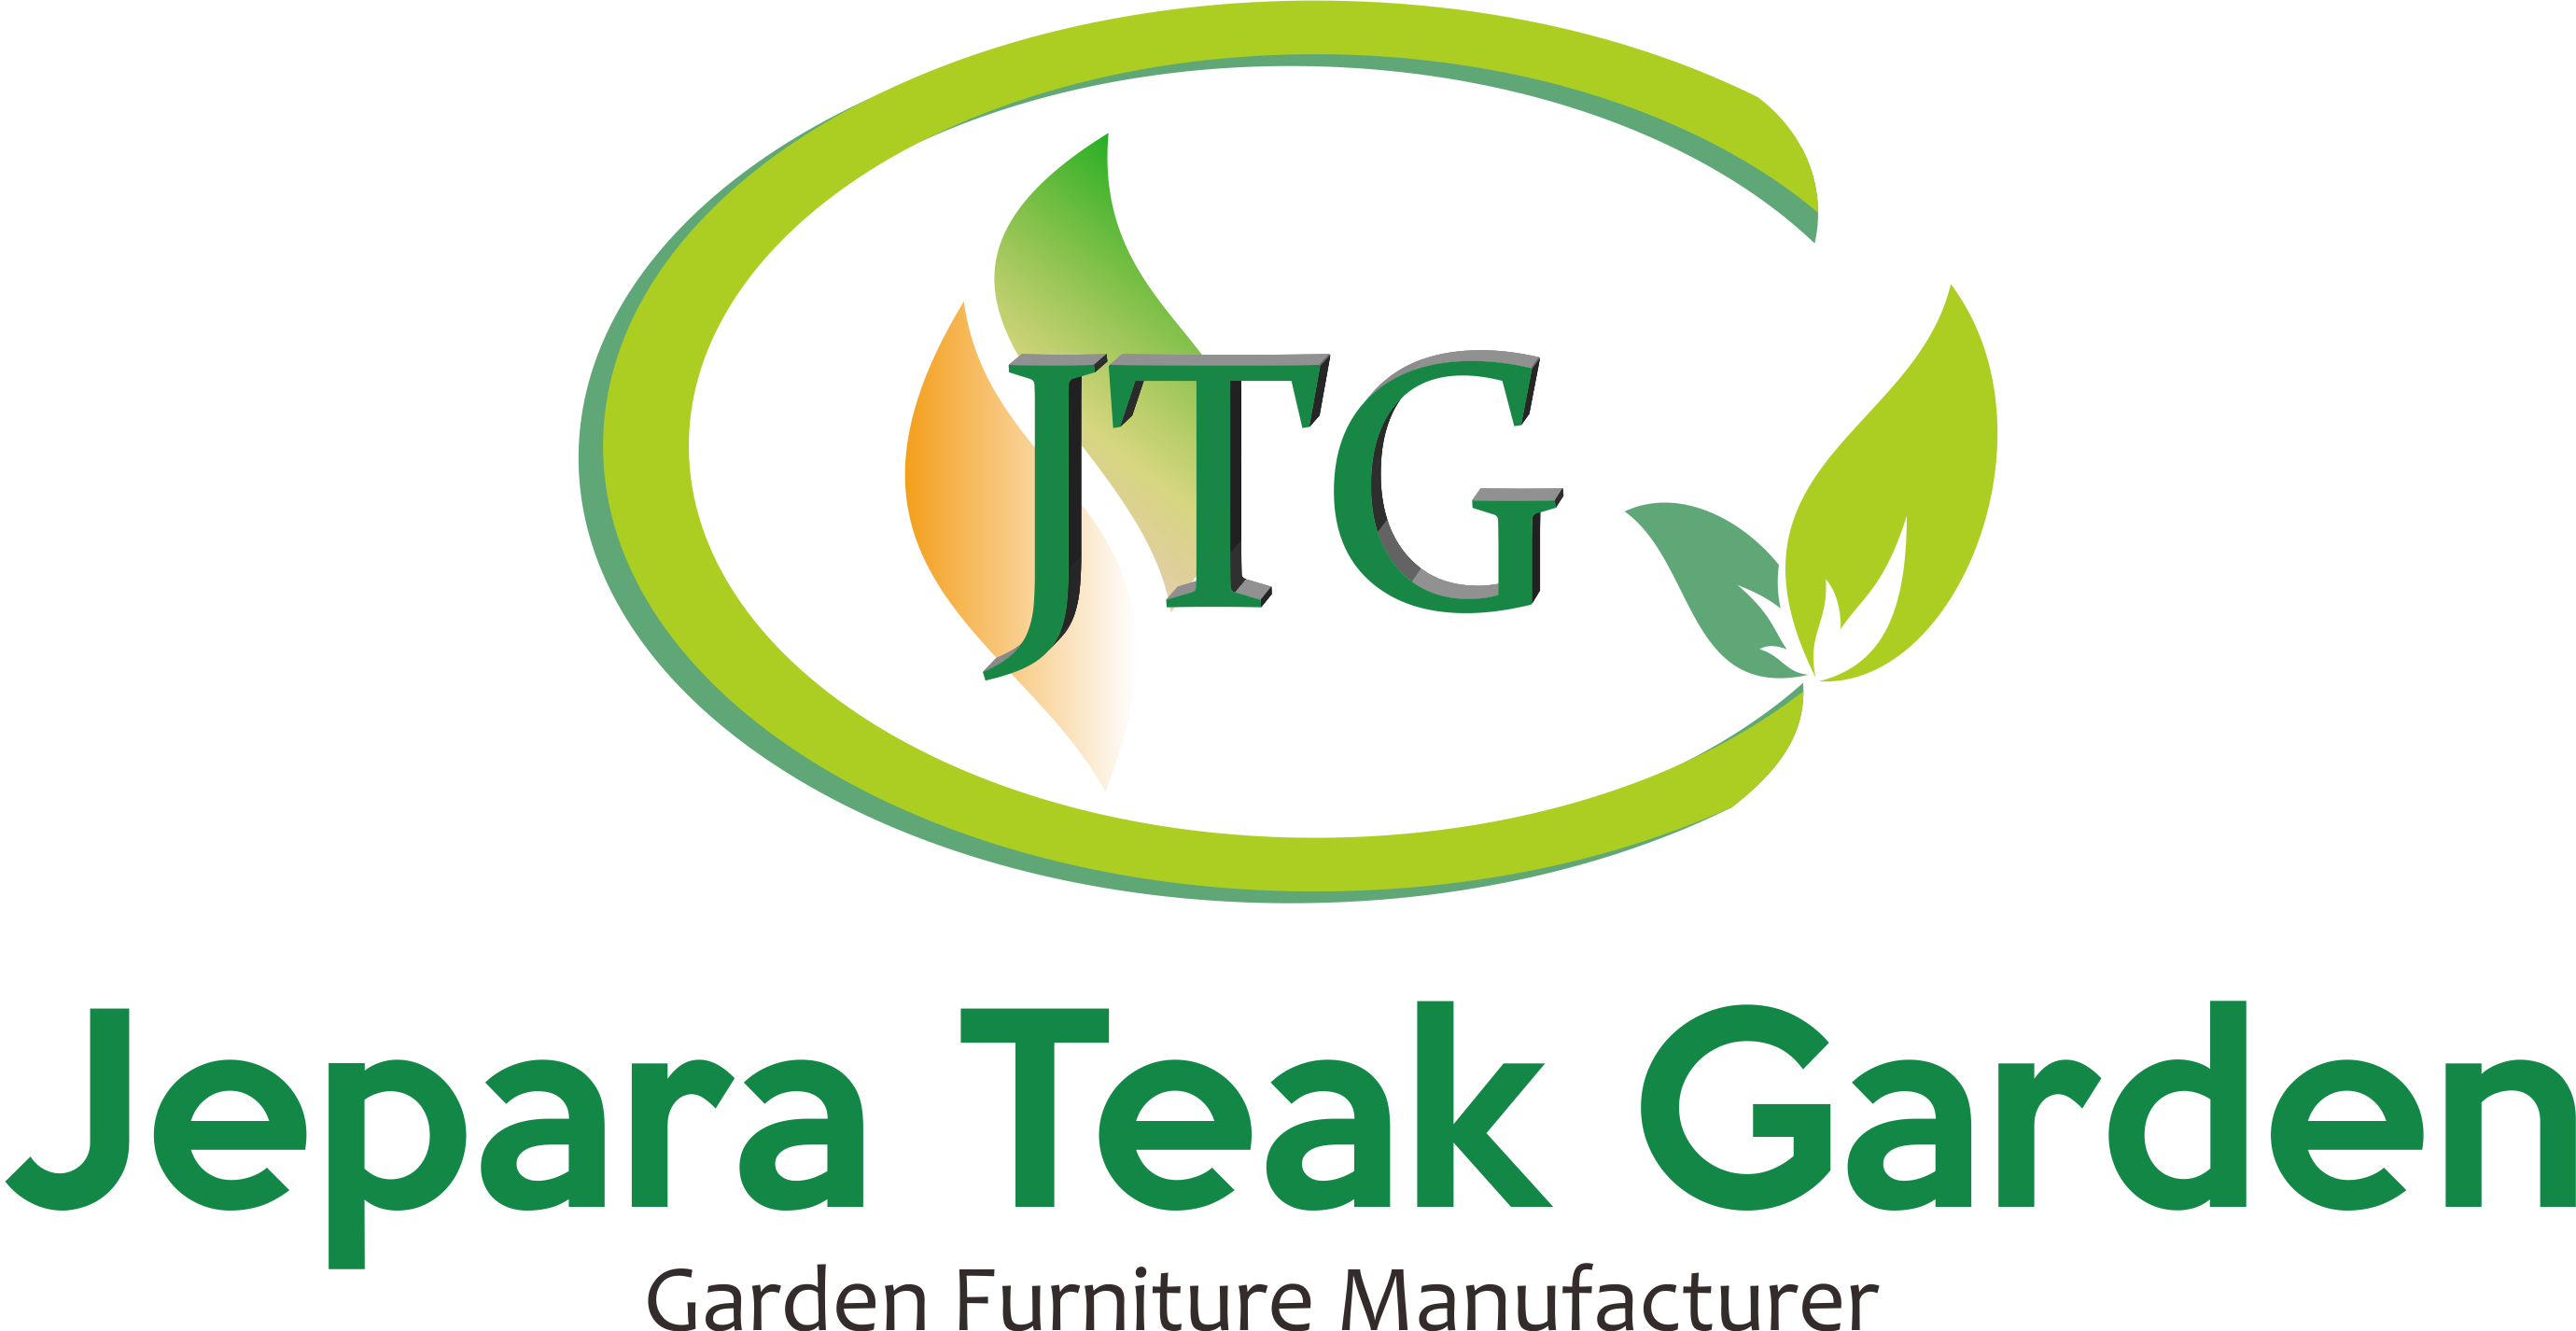 Jepara Teak Garden